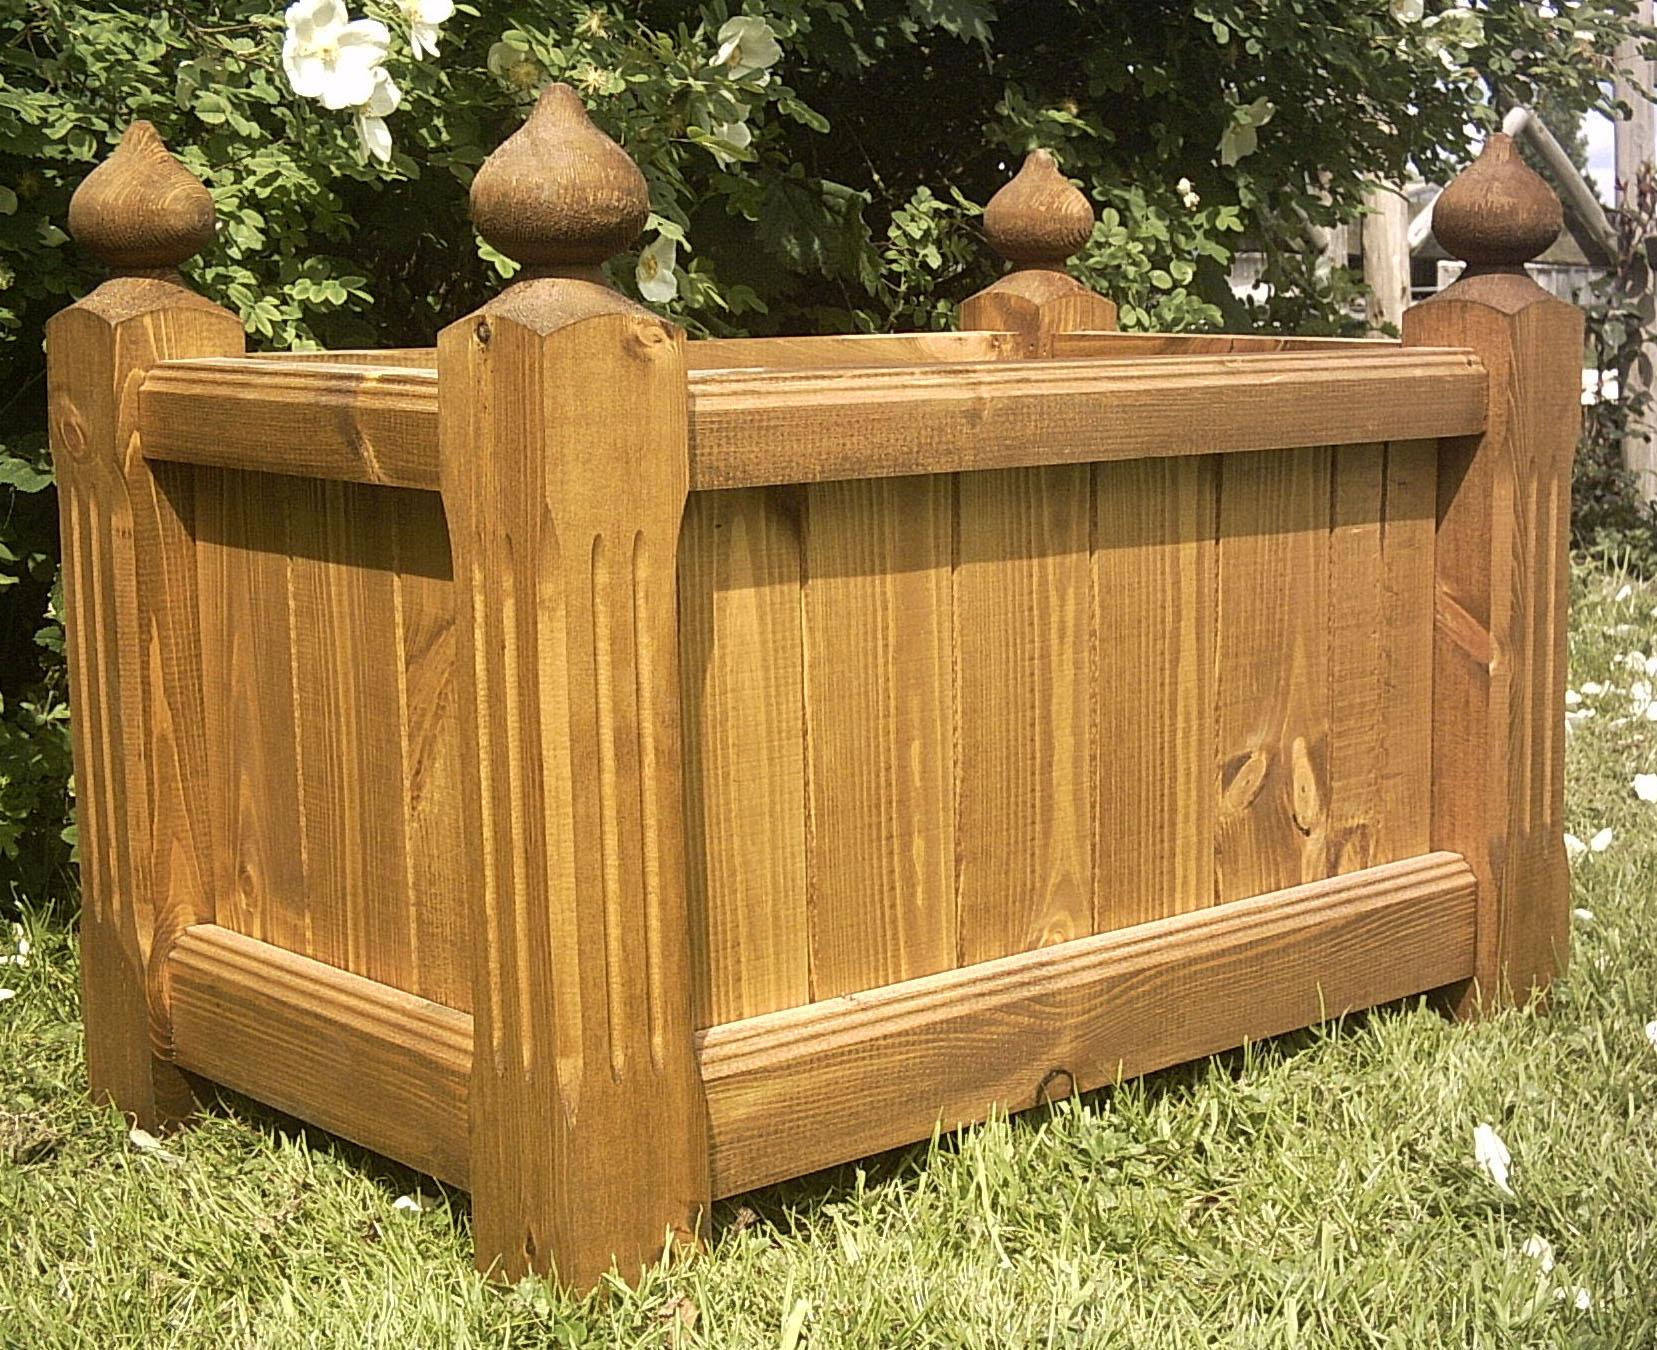 large wooden planter gardening planters raised beds. Black Bedroom Furniture Sets. Home Design Ideas